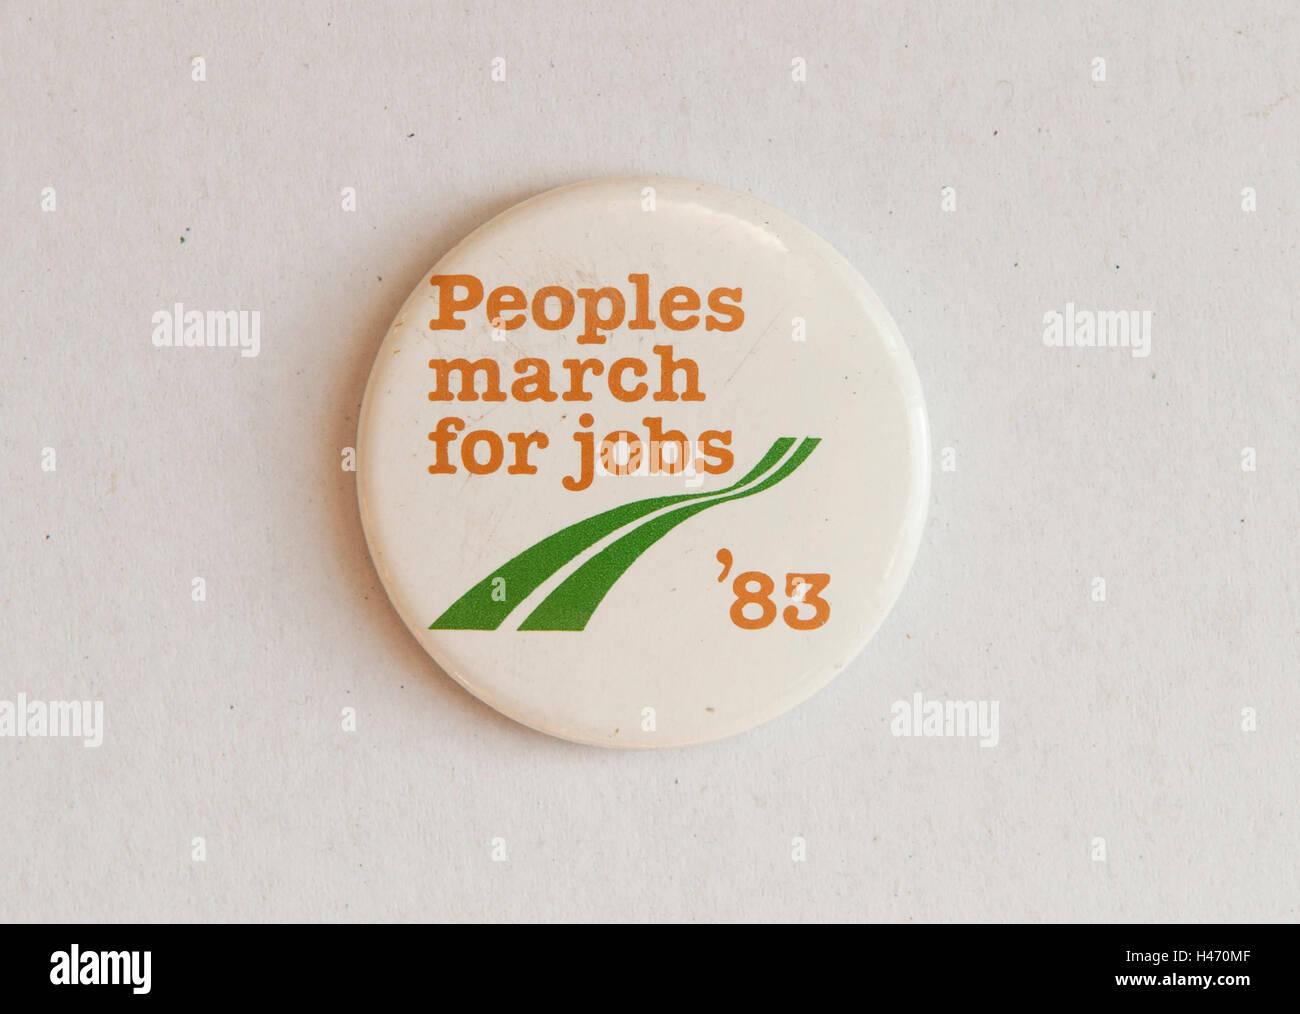 Peuples autochtones pour l'emploi, mars pin's badge utiliser 1983 HOMER SYKES Photo Stock